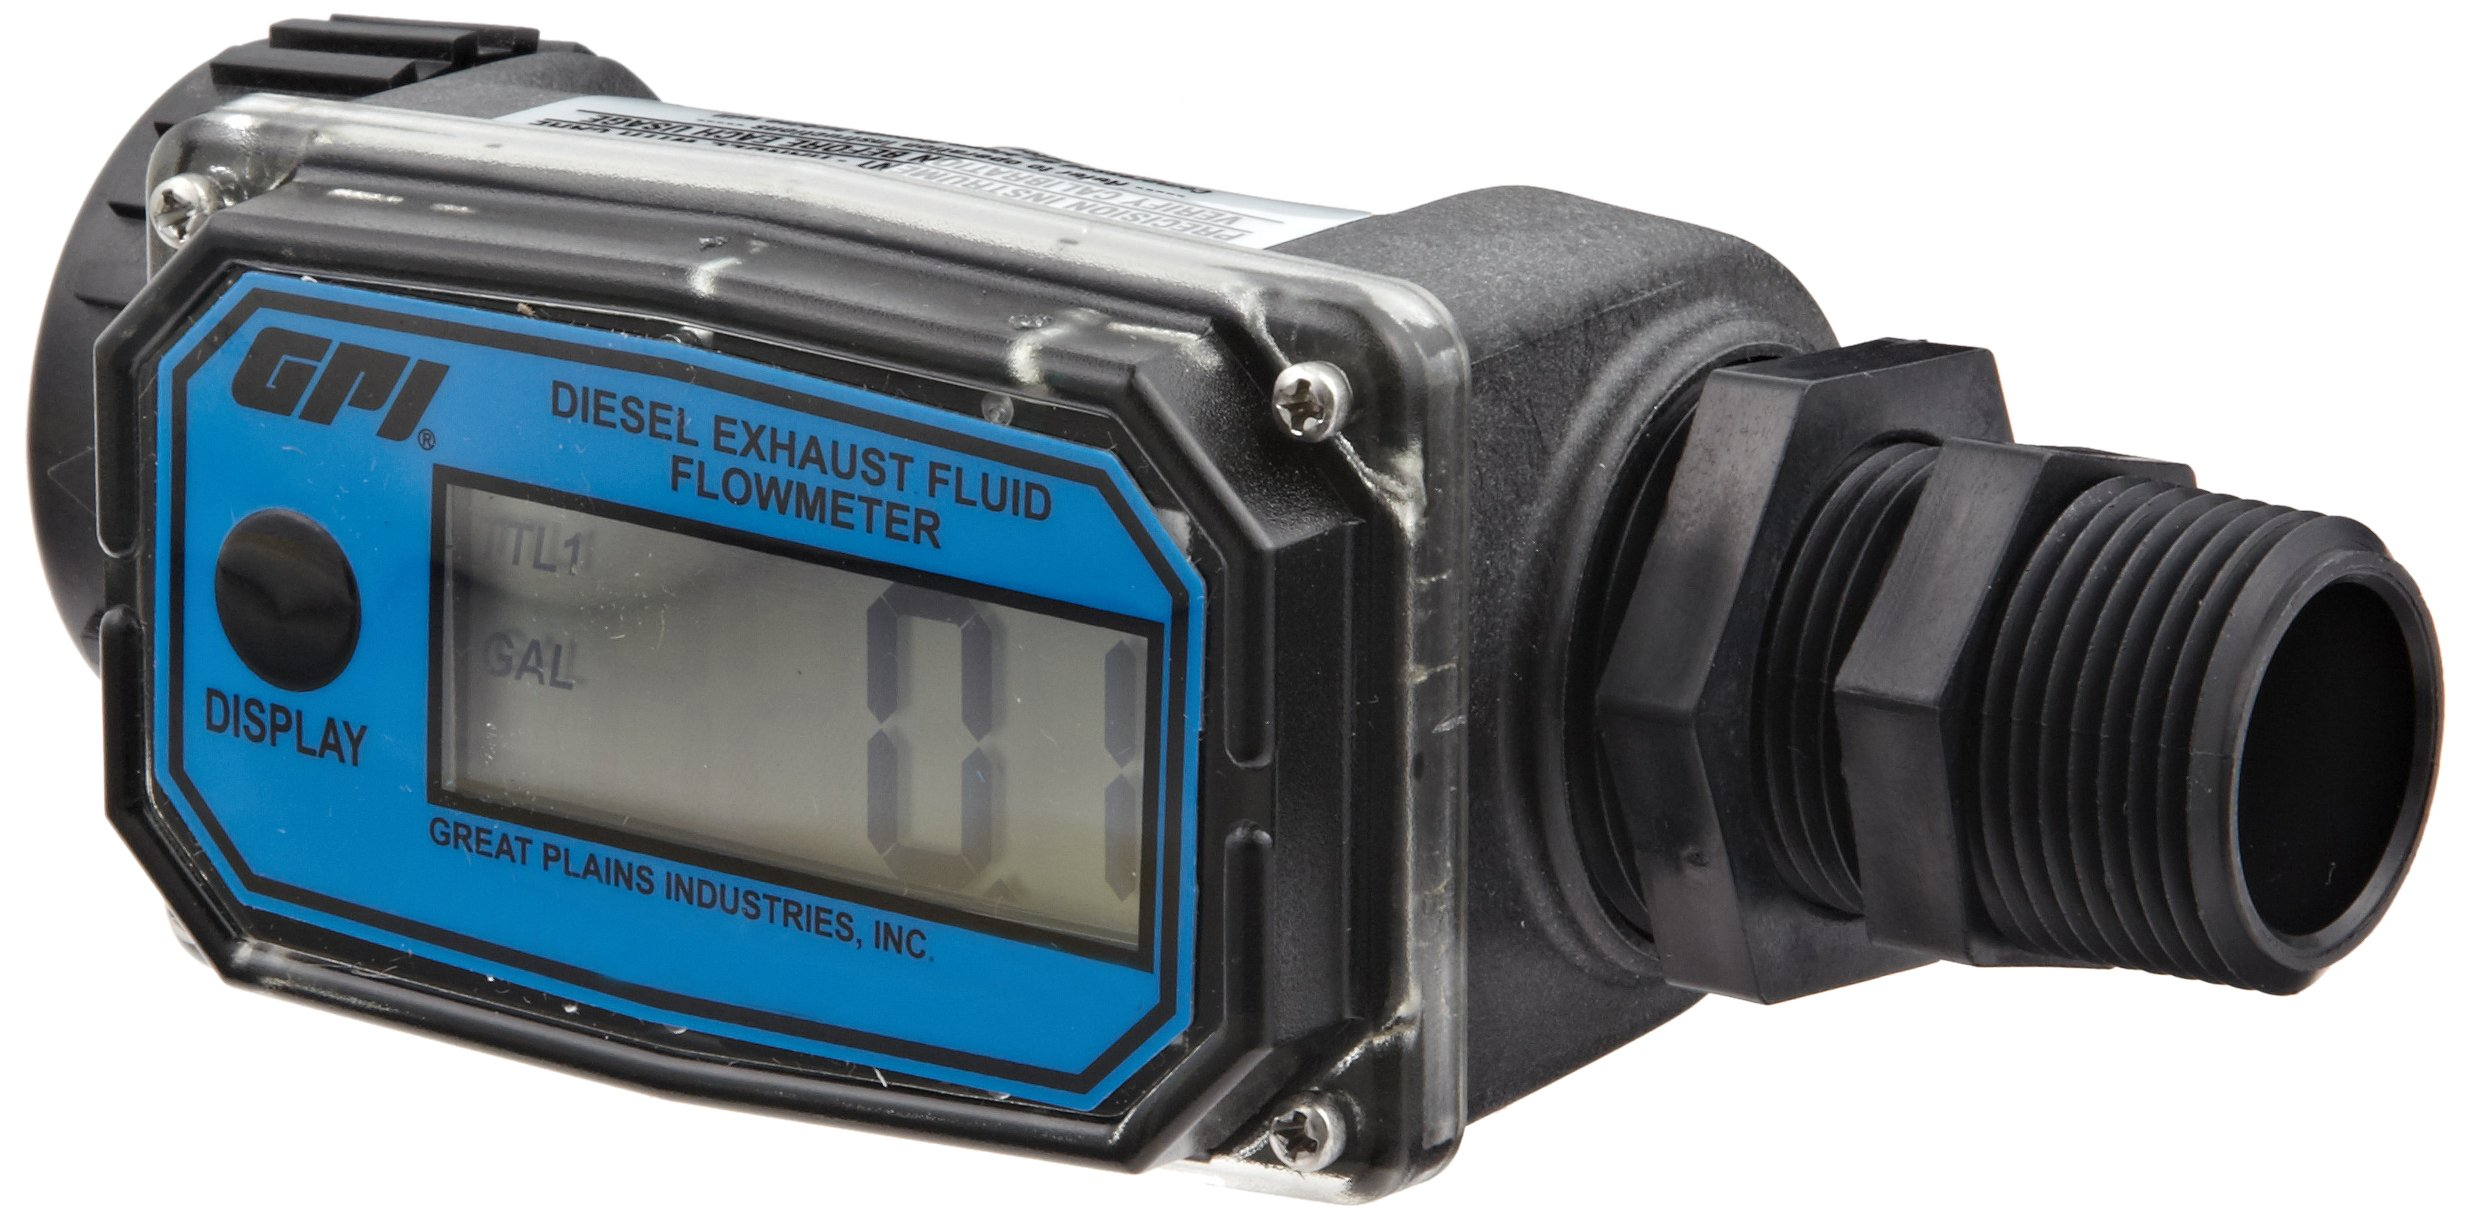 GPI 113255-24, 01N31GM-U Nylon Turbine DEF Flowmeter with Digital LCD Display, 3-30 GPM, 1-Inch FNPT Inlet/Outlet